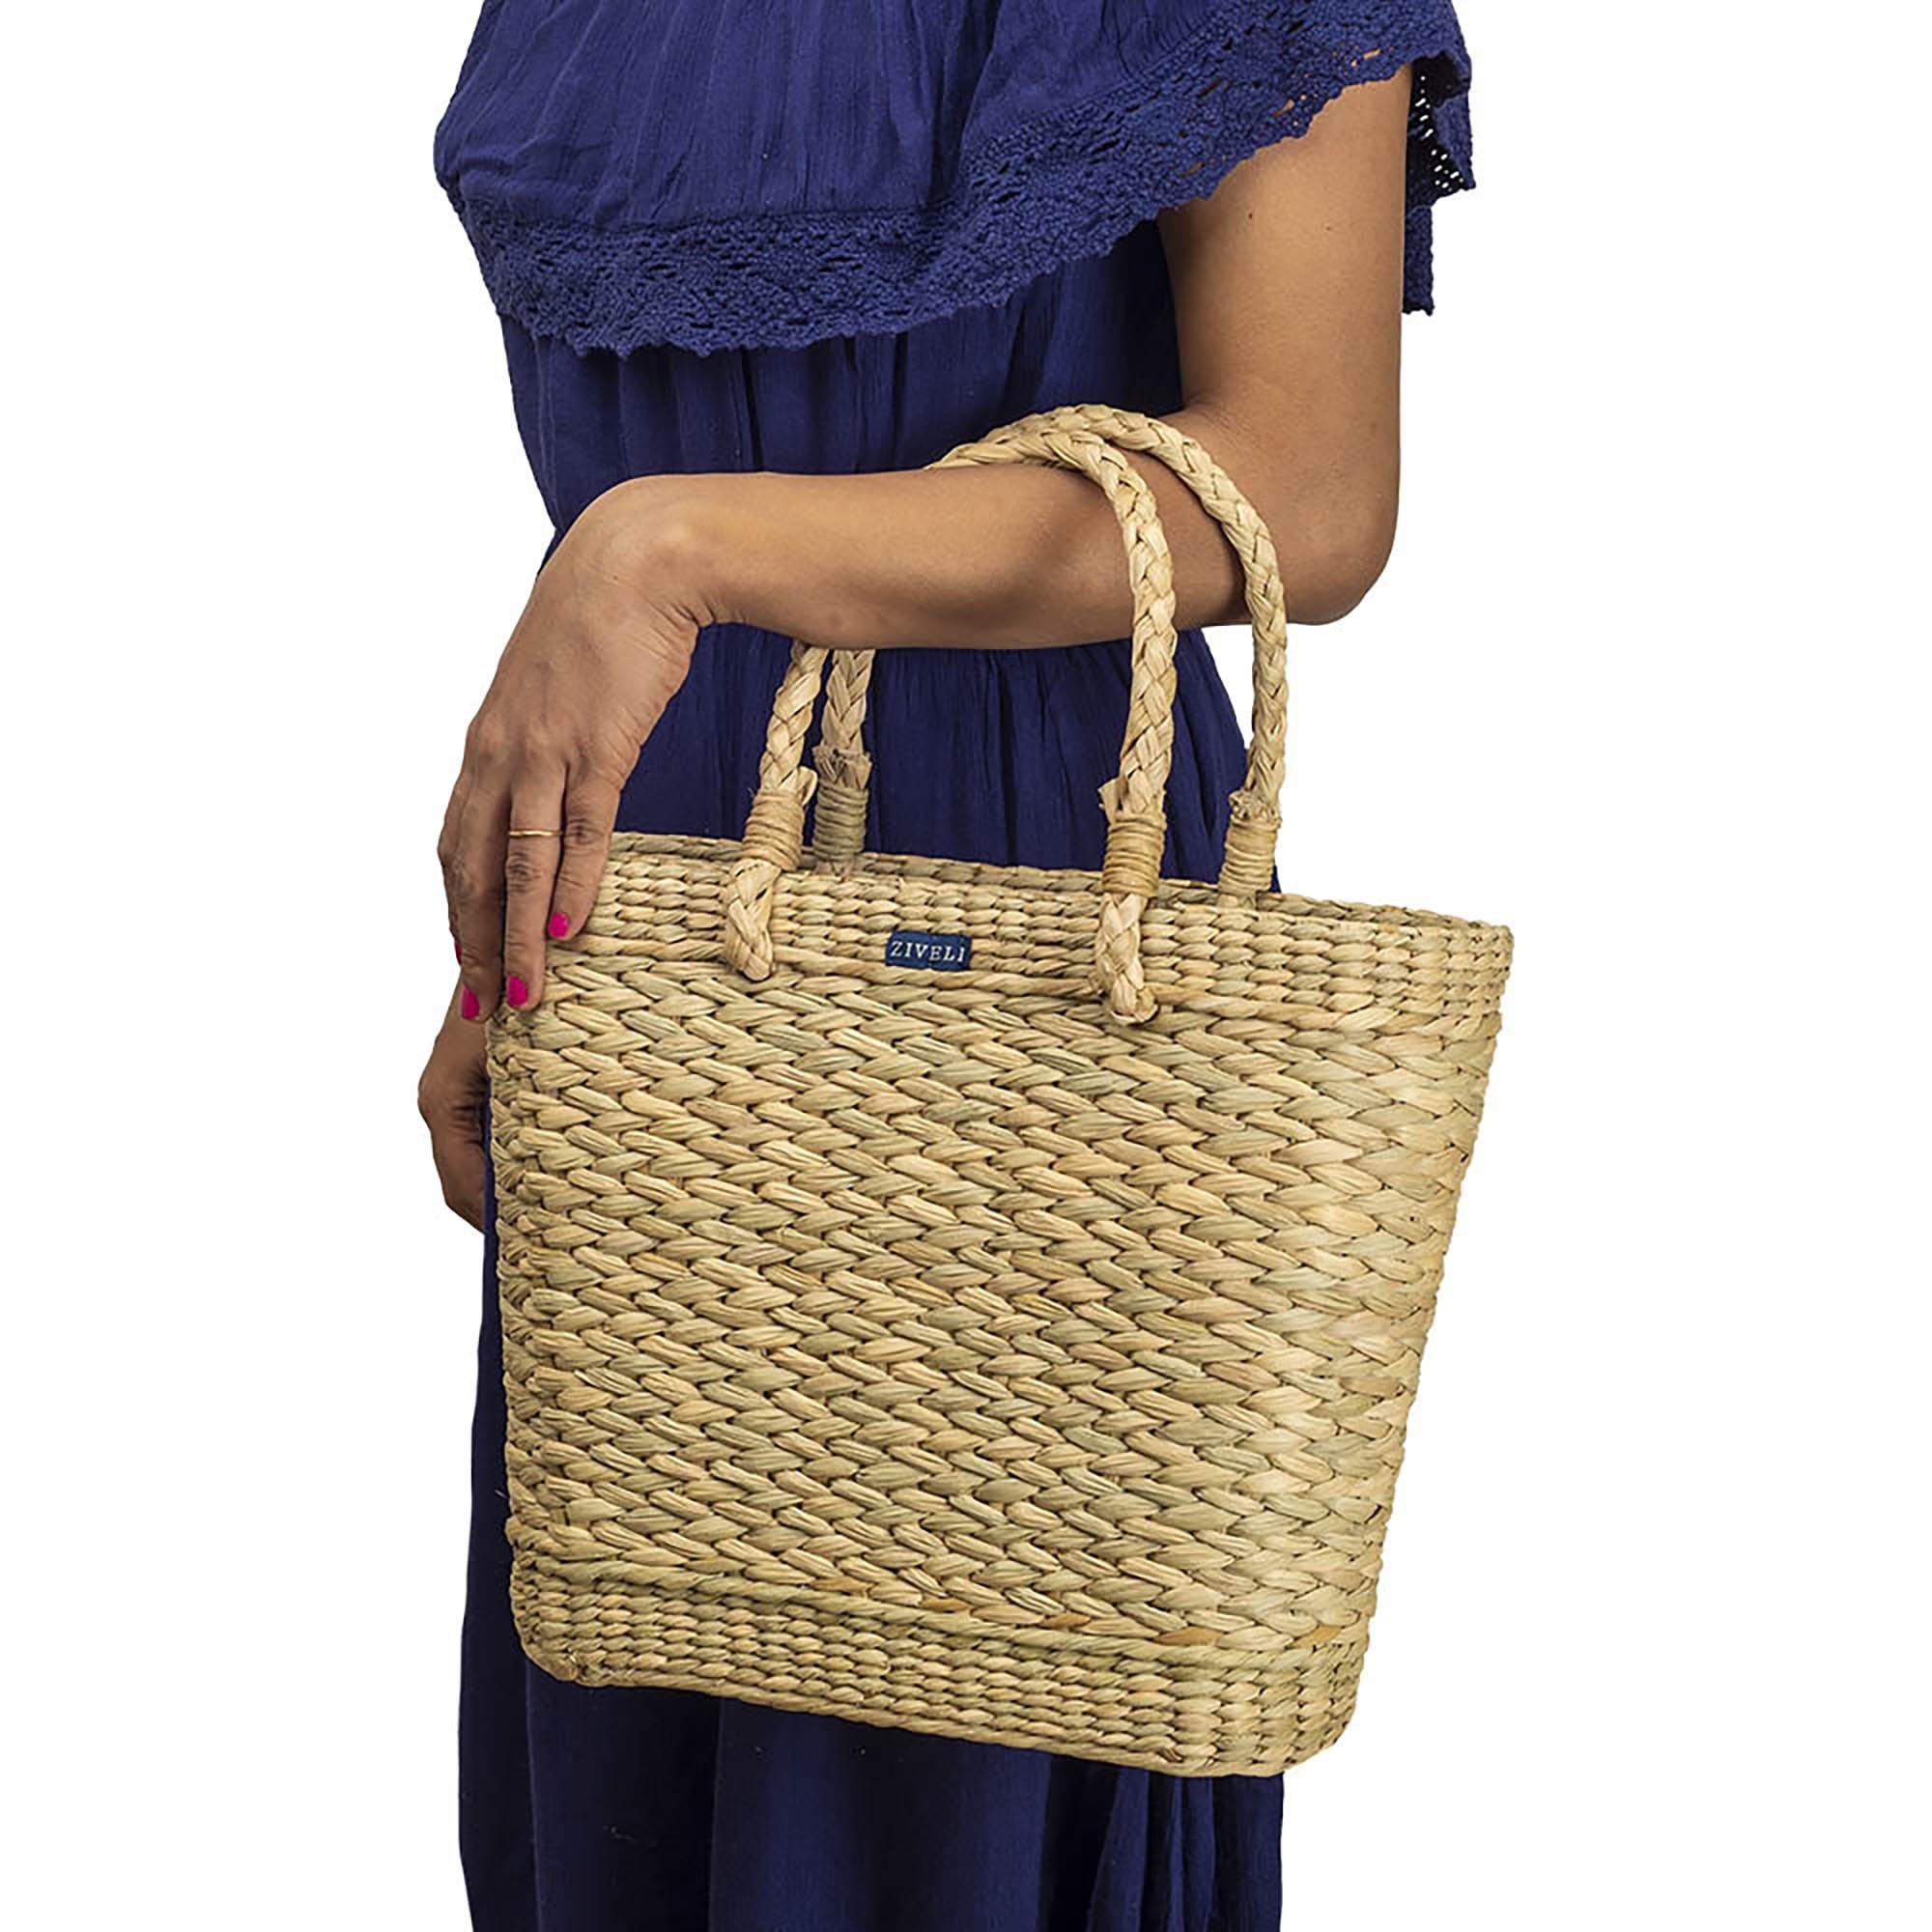 Kauna Reed Small Market Bag